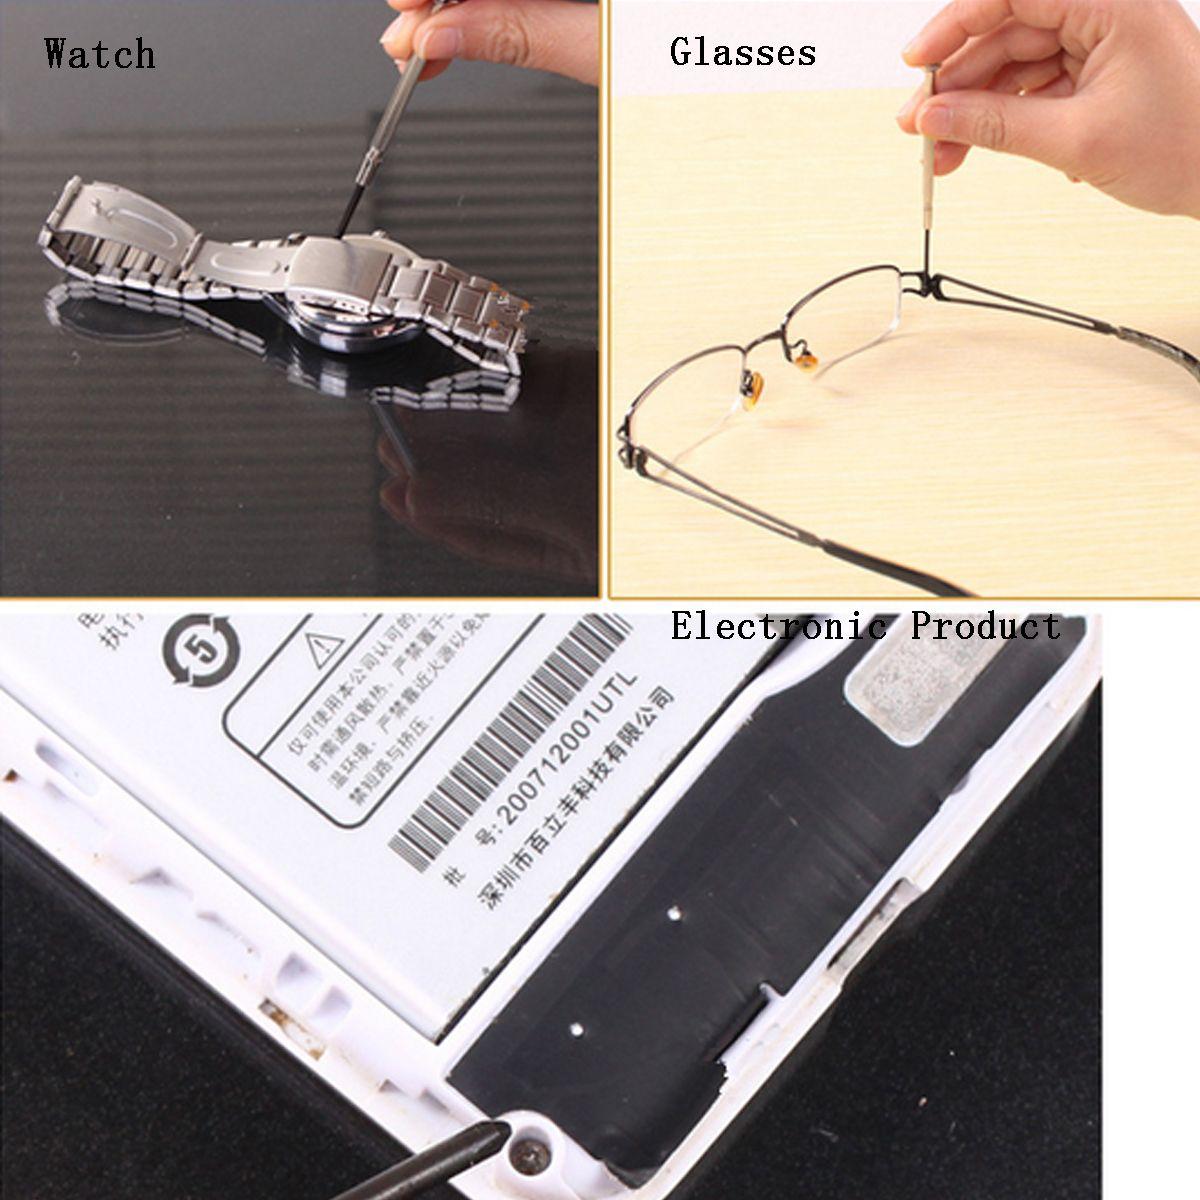 Precision Mini Hex Screwdriver Set Electronic Micro Hobby Jeweler Watch Repair Tool